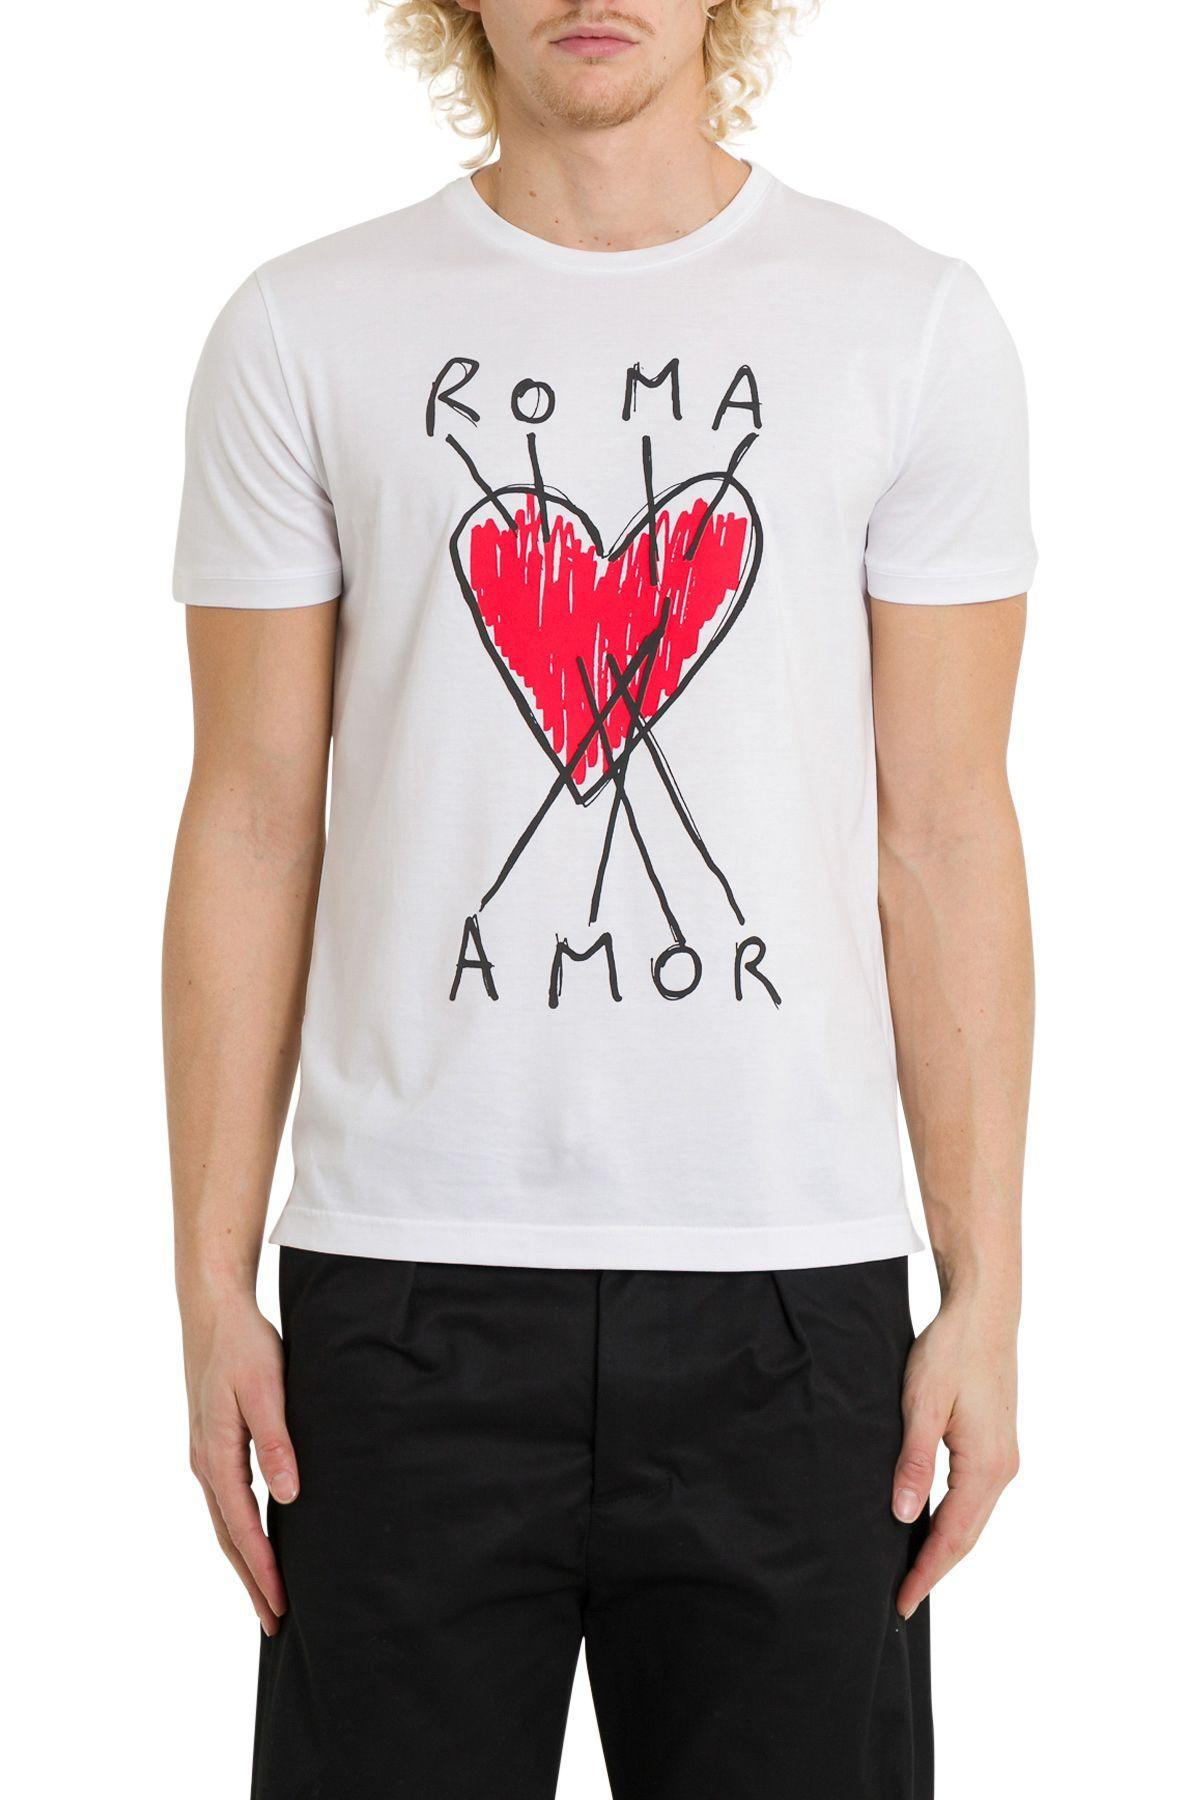 45b9a52152 FENDI ROMA AMOR TEE. #fendi #cloth | Fendi in 2019 | Fendi, Fendi ...